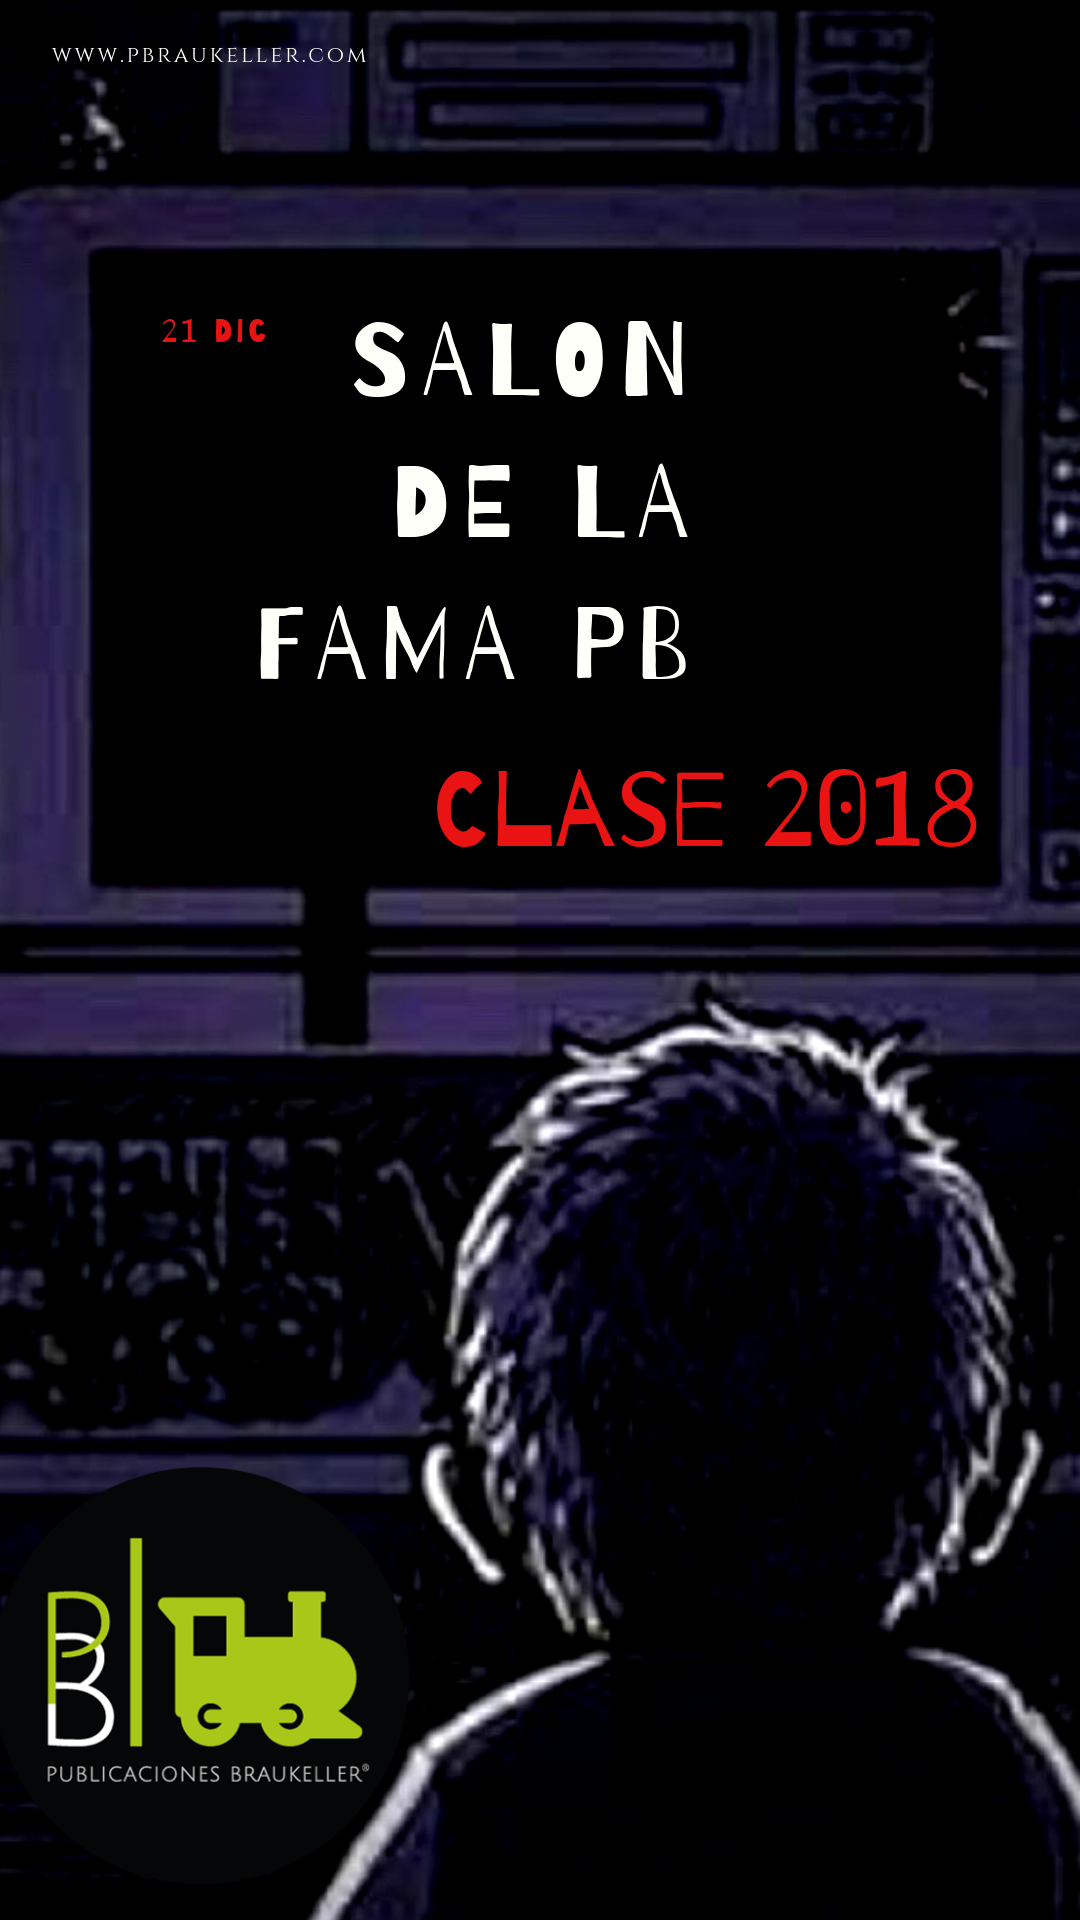 Salon de la fama PB clase 2018